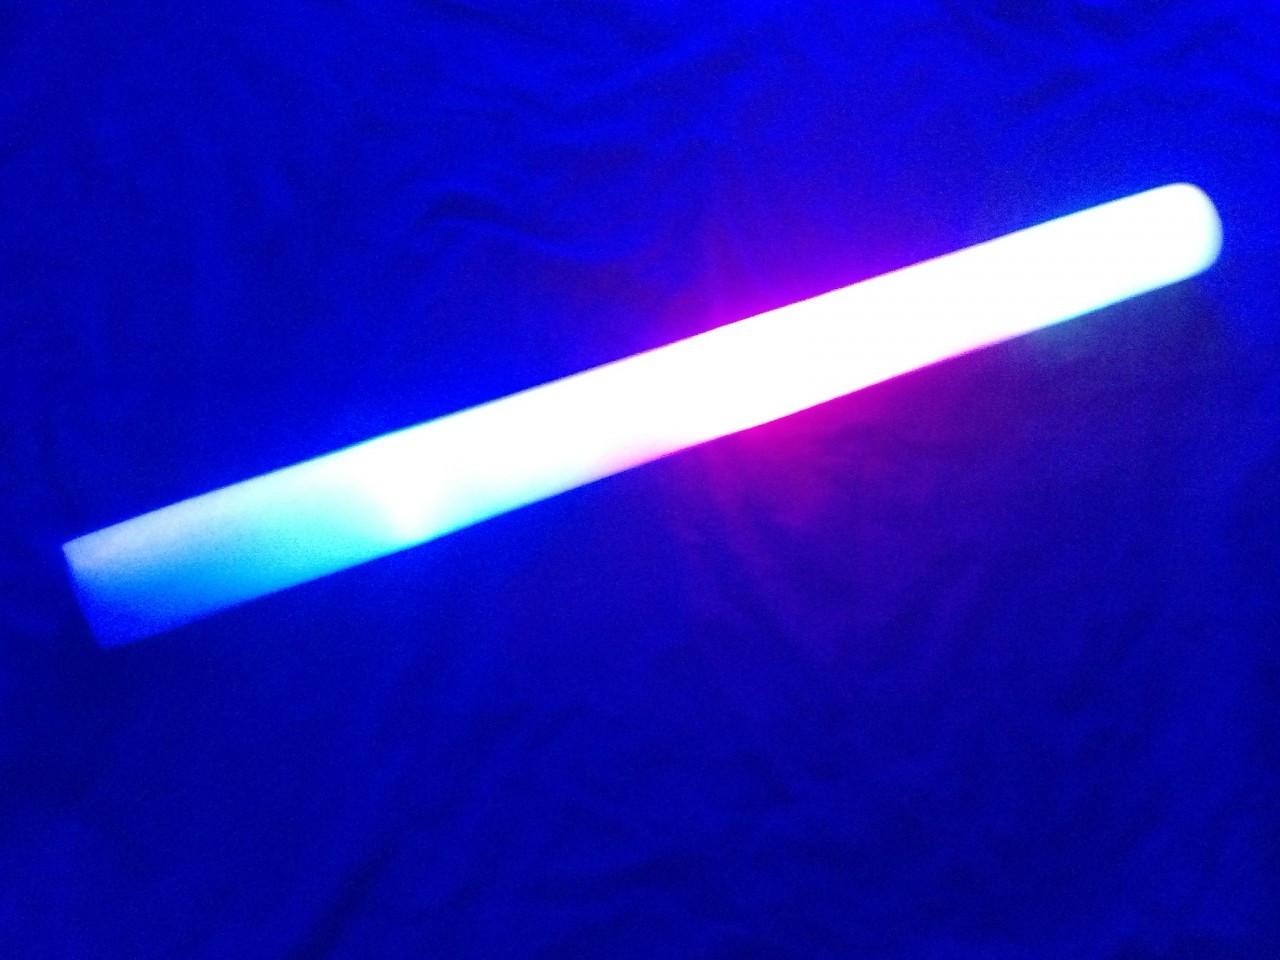 LED , LED BATON, Custom LED Foam Stick, Customized, Personalized, EDM, Electro, House, Promo, Nightclub, Baton, Wand, Stix, Glow, Light up, Lit up, Electronic, Coachella, Grand Central, Foam Sticks, Foam Stix, Glow Sticks, Illuminated, Foam Baton,